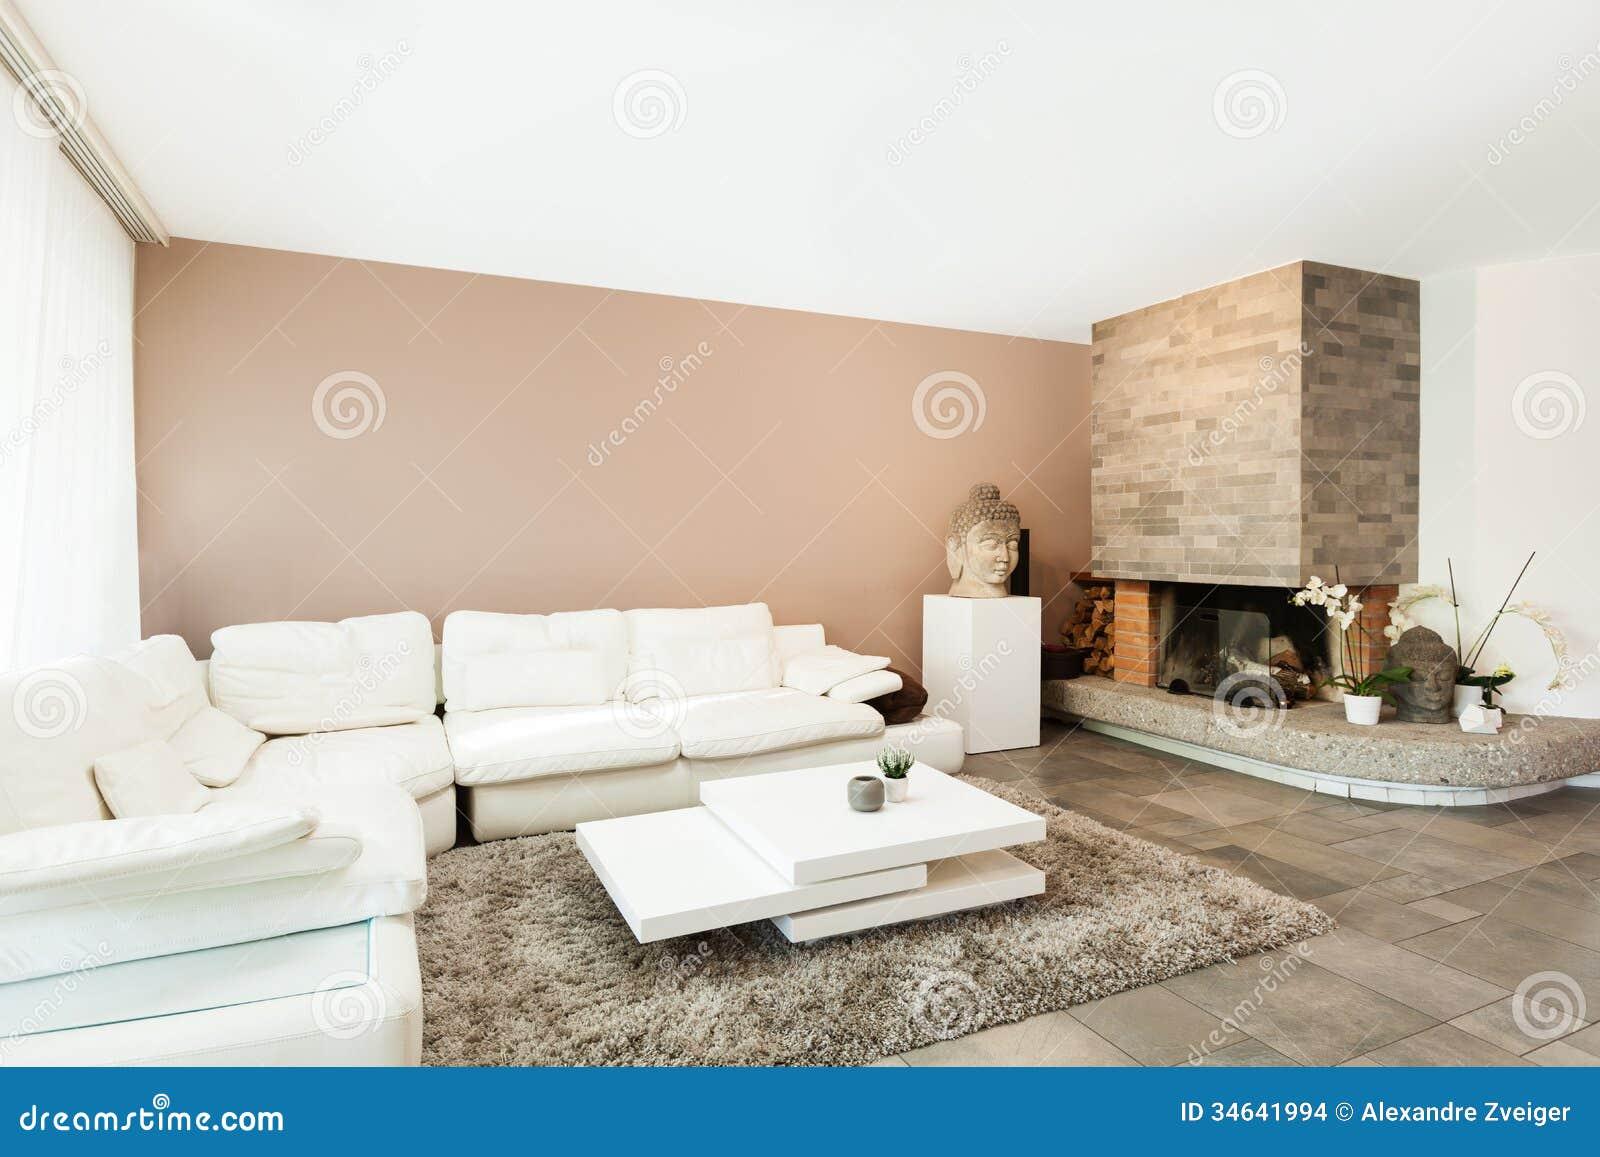 Interior beautiful apartment stock images image 34641994 for Beautiful flats interior